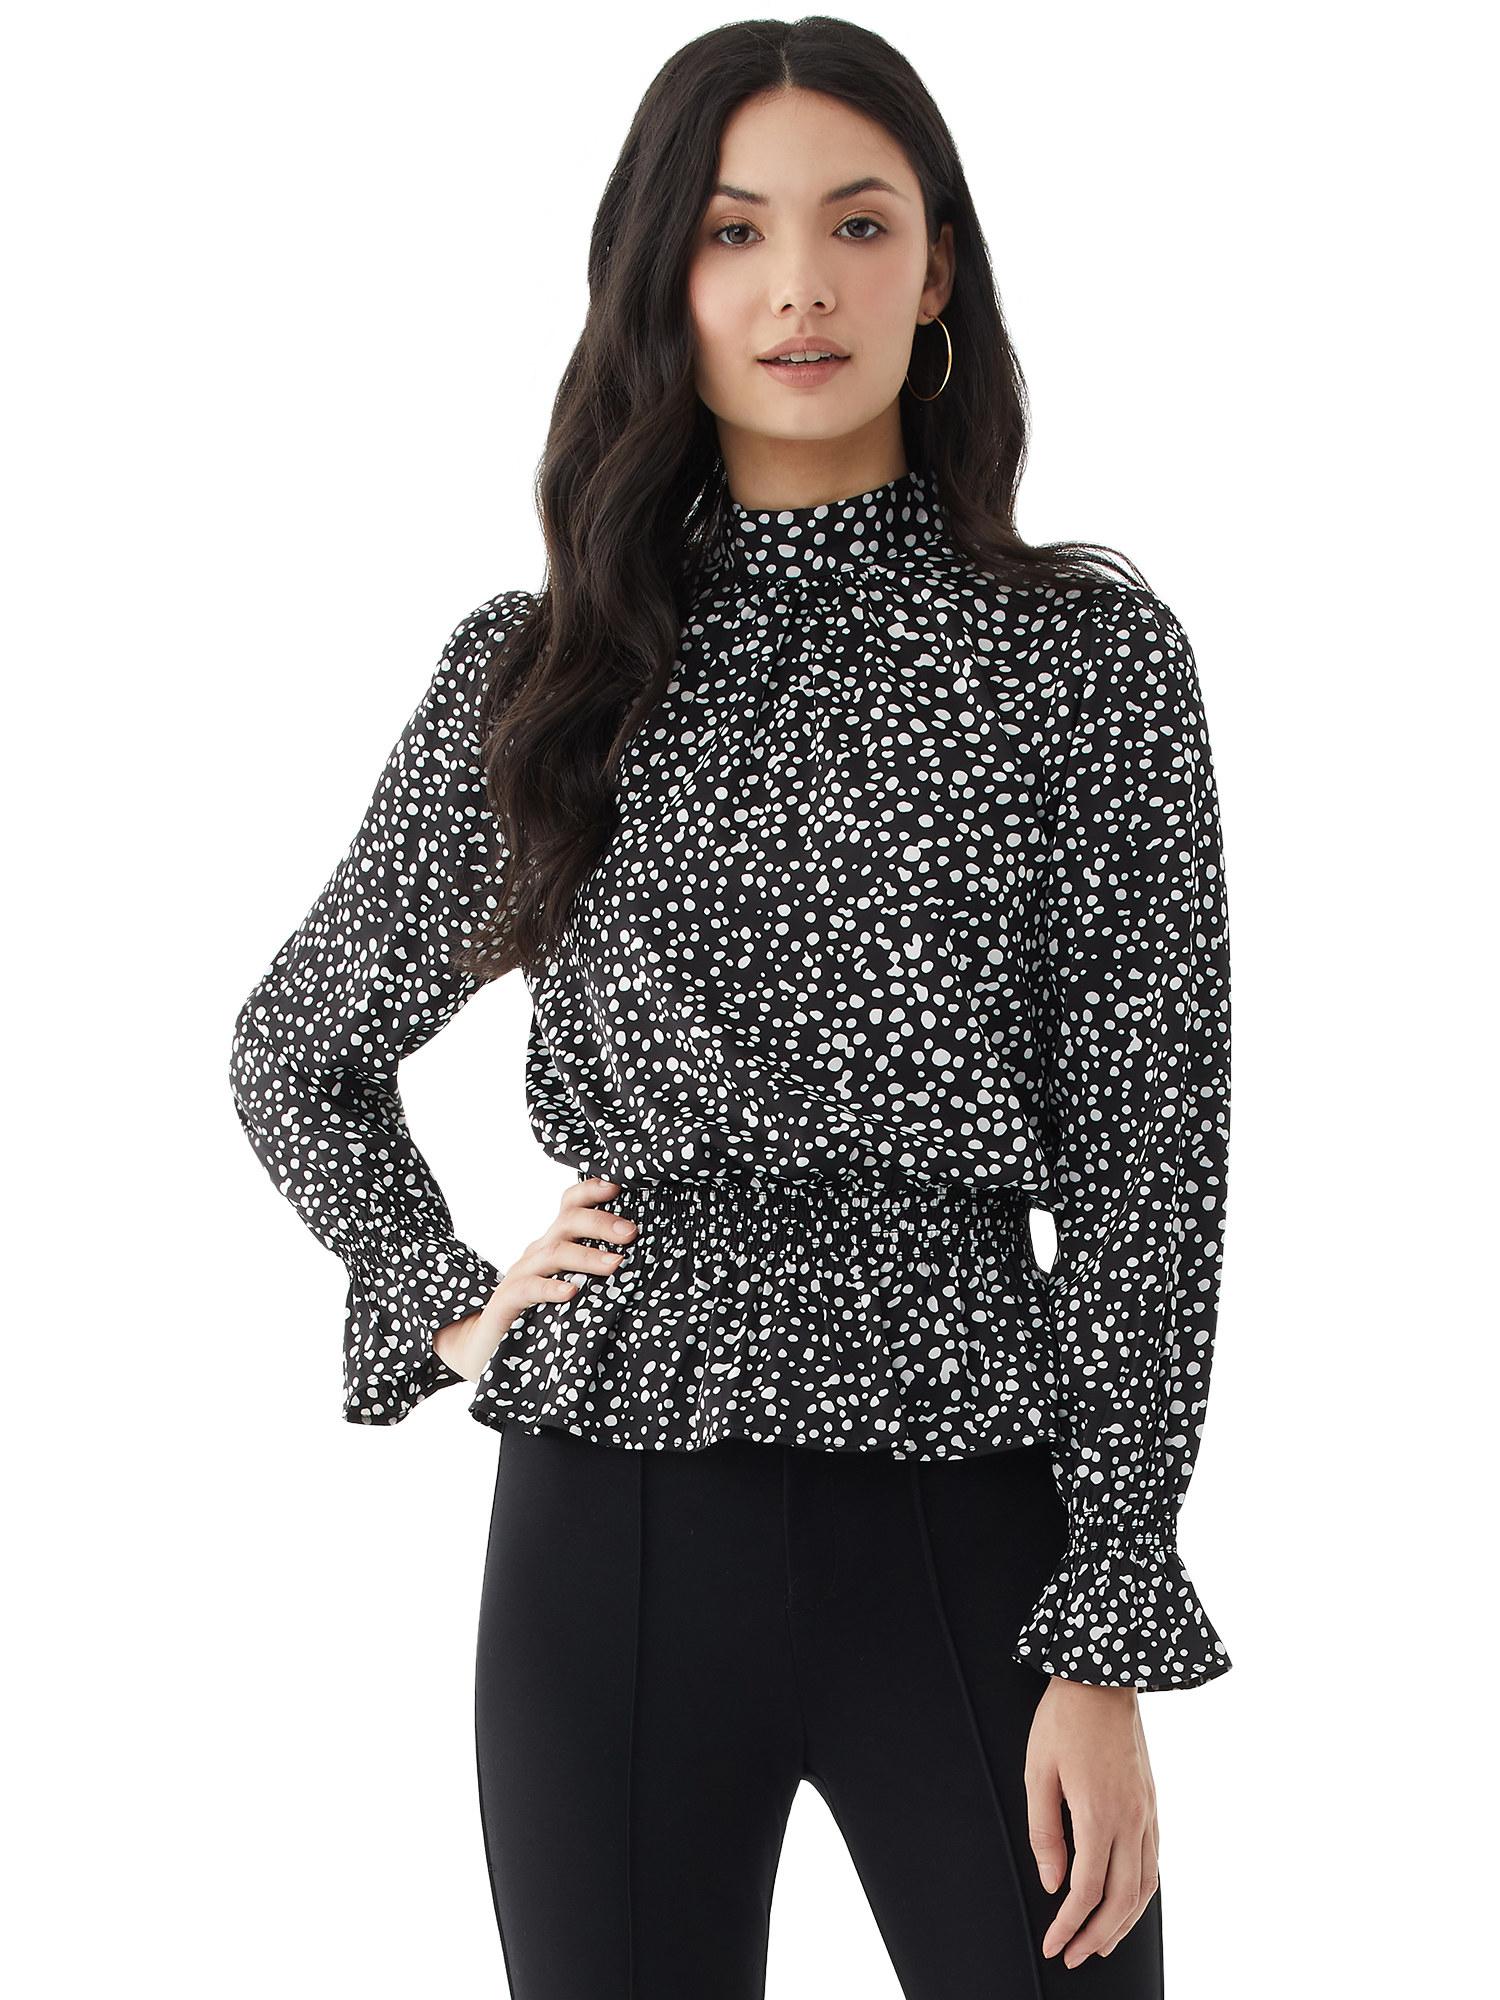 Model wears peplum waist top in black abstract dot